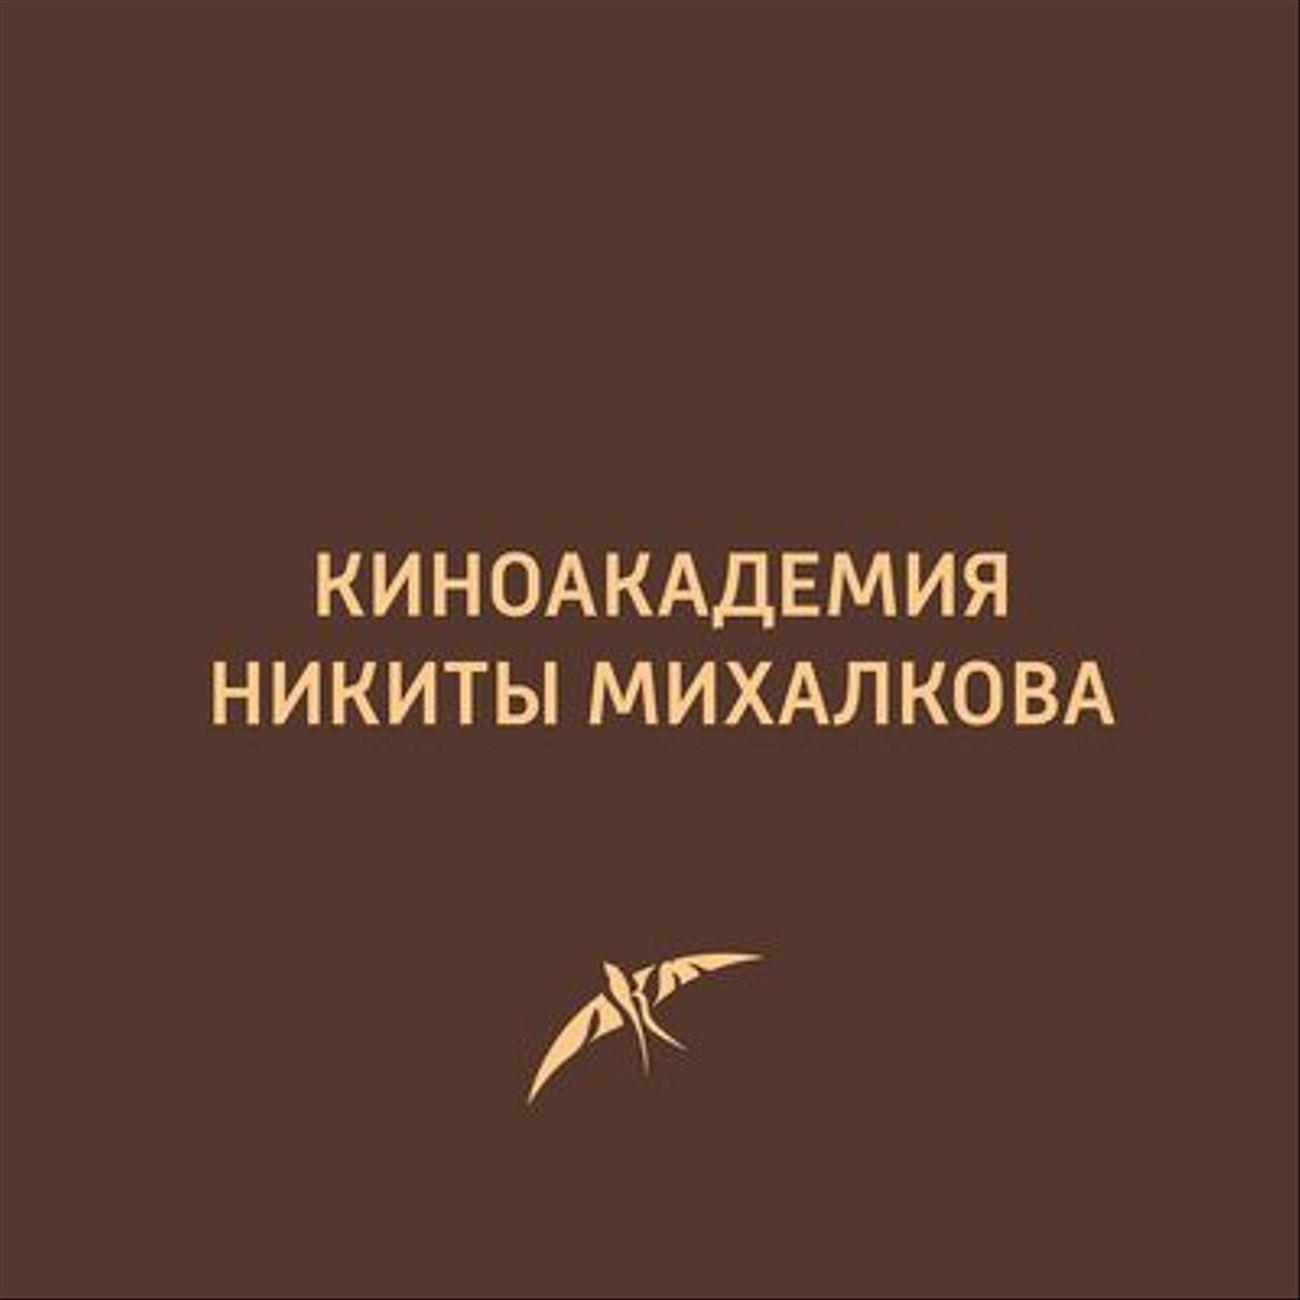 Киноакадемия Н.С. Михалкова